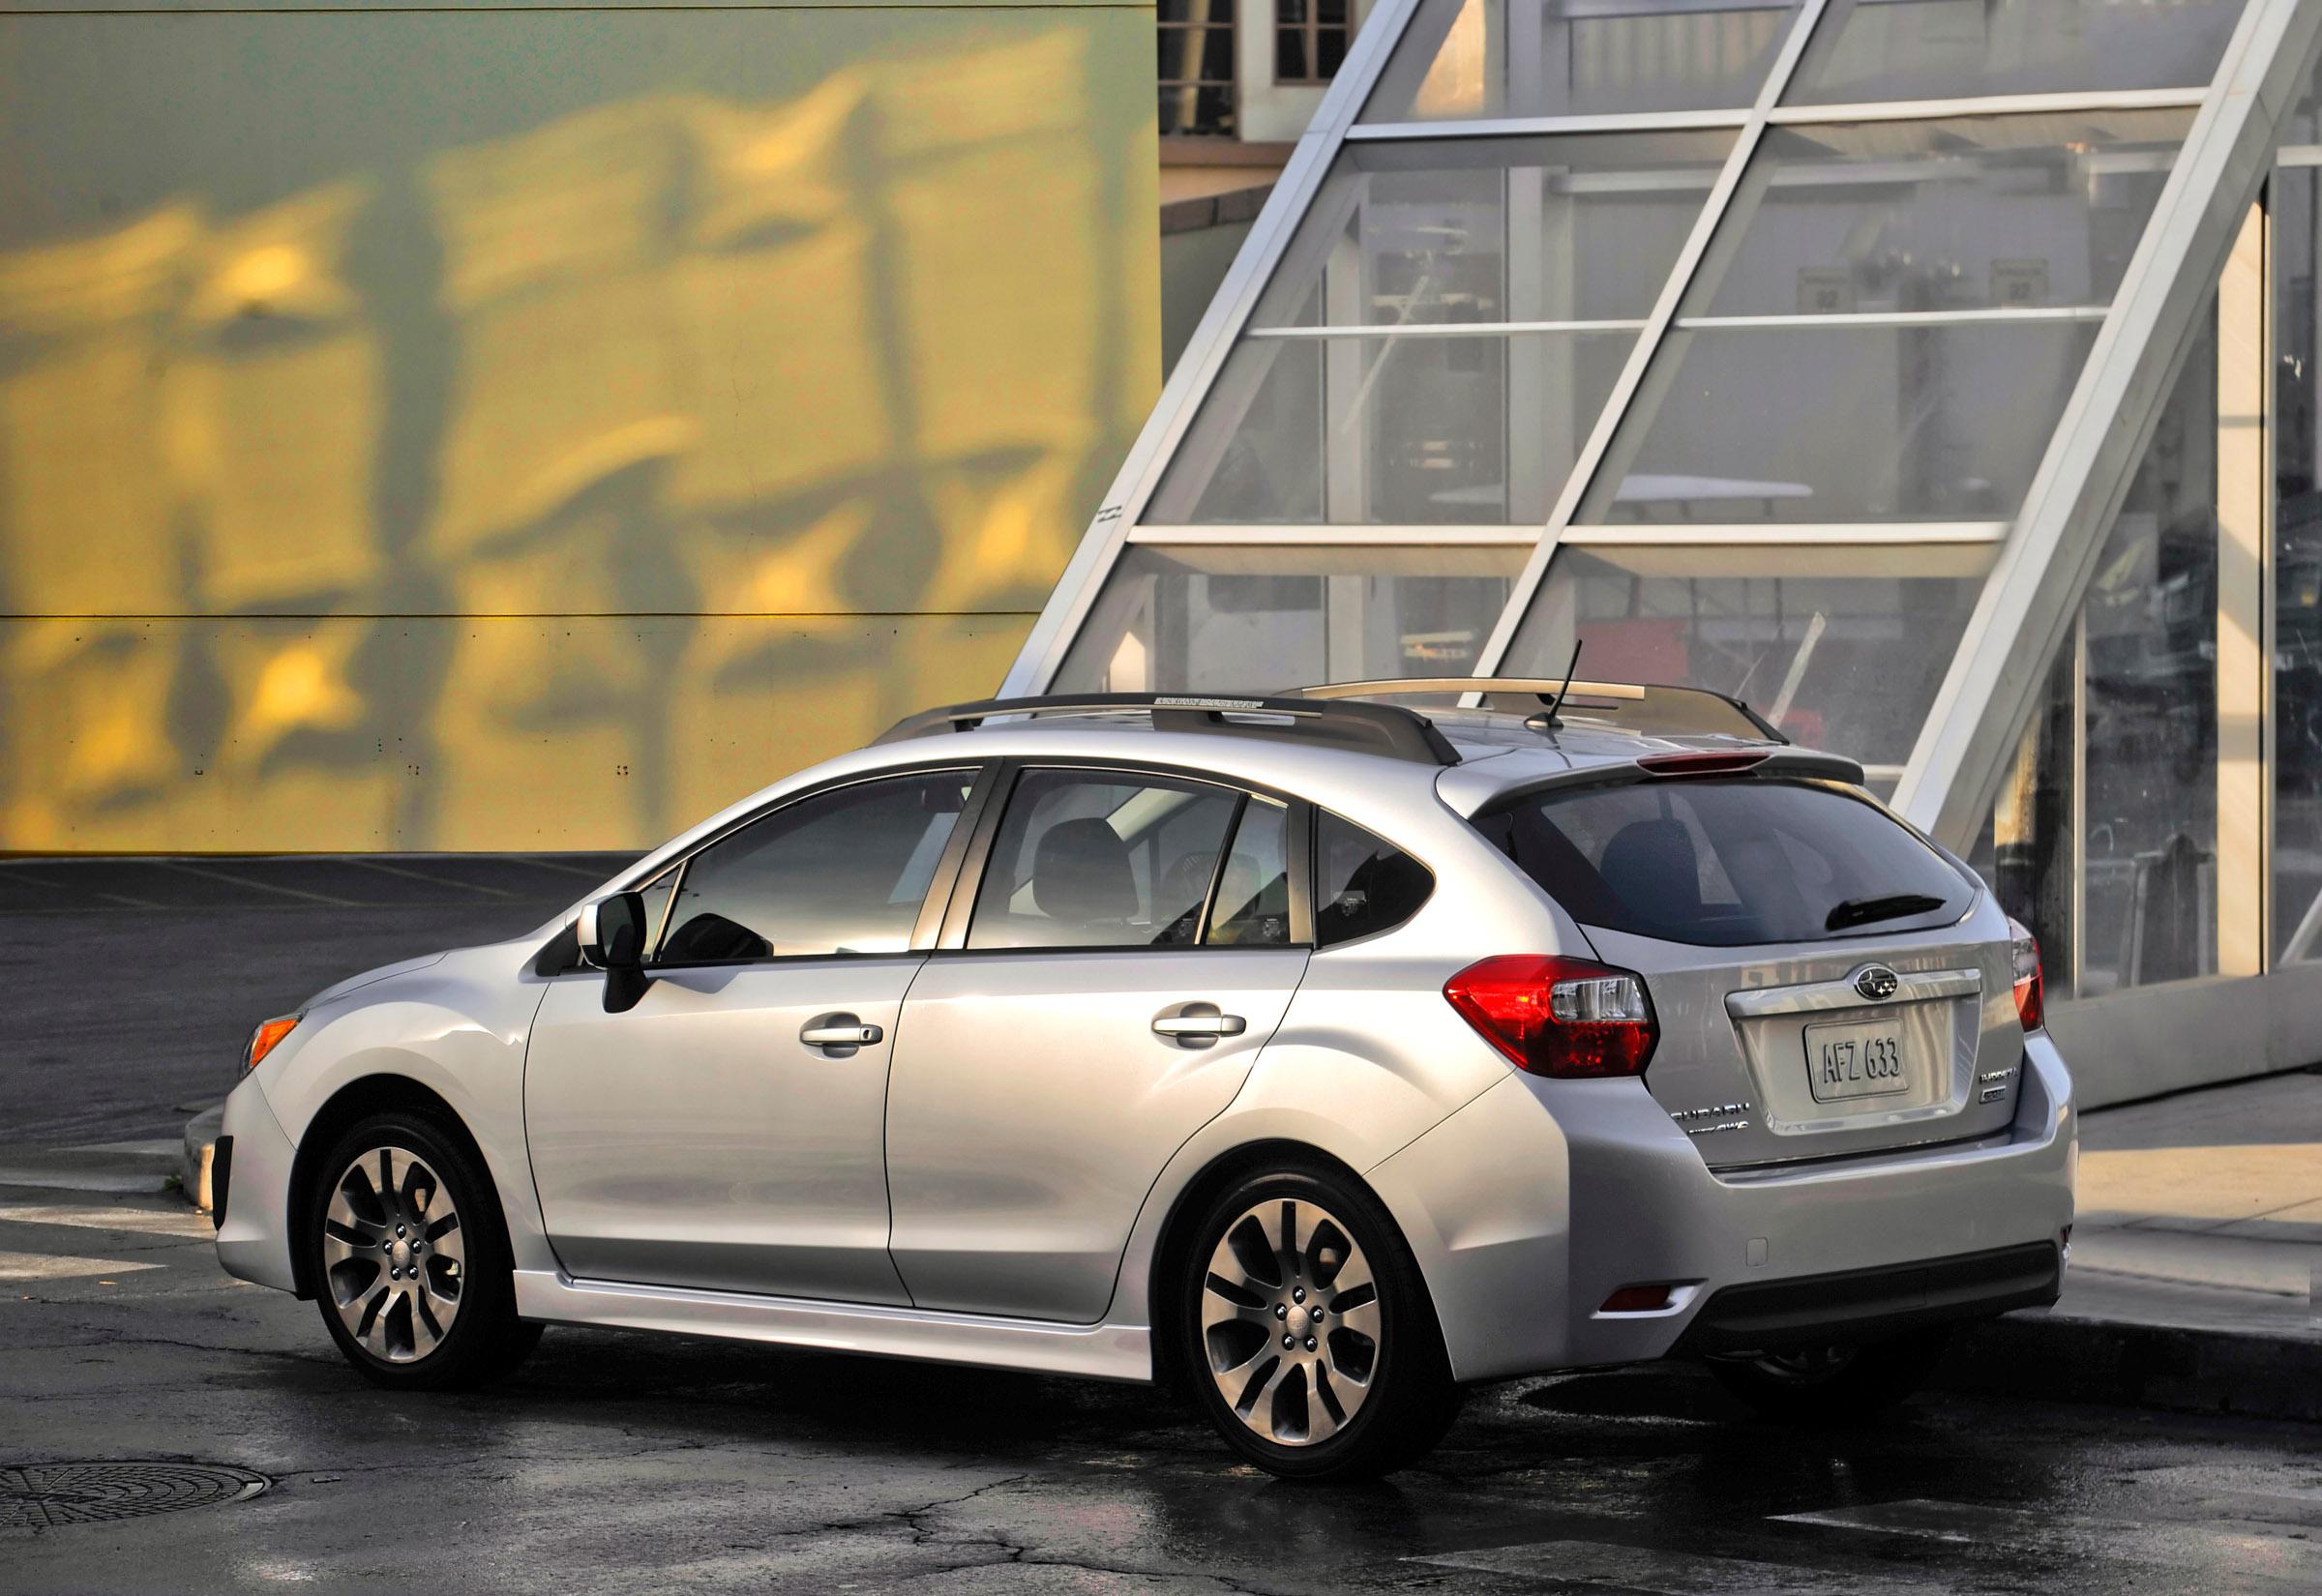 2012 subaru impreza officially introduced 2012 subaru impreza 20i sport limited 5 door vanachro Choice Image